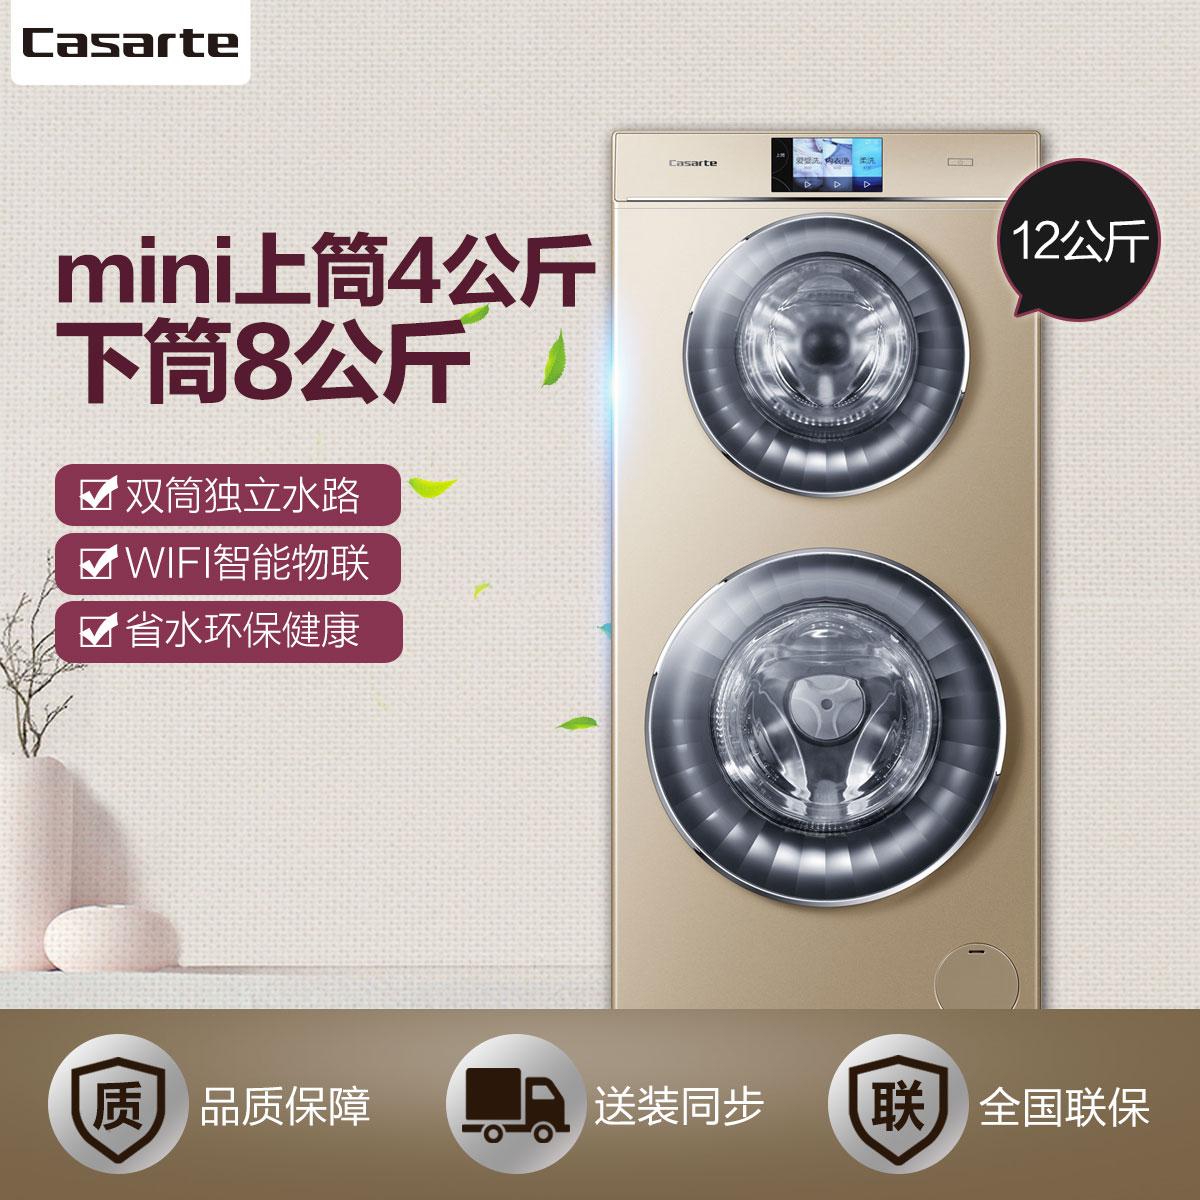 Casarte/卡萨帝 滚筒洗衣机 C8 U12G1